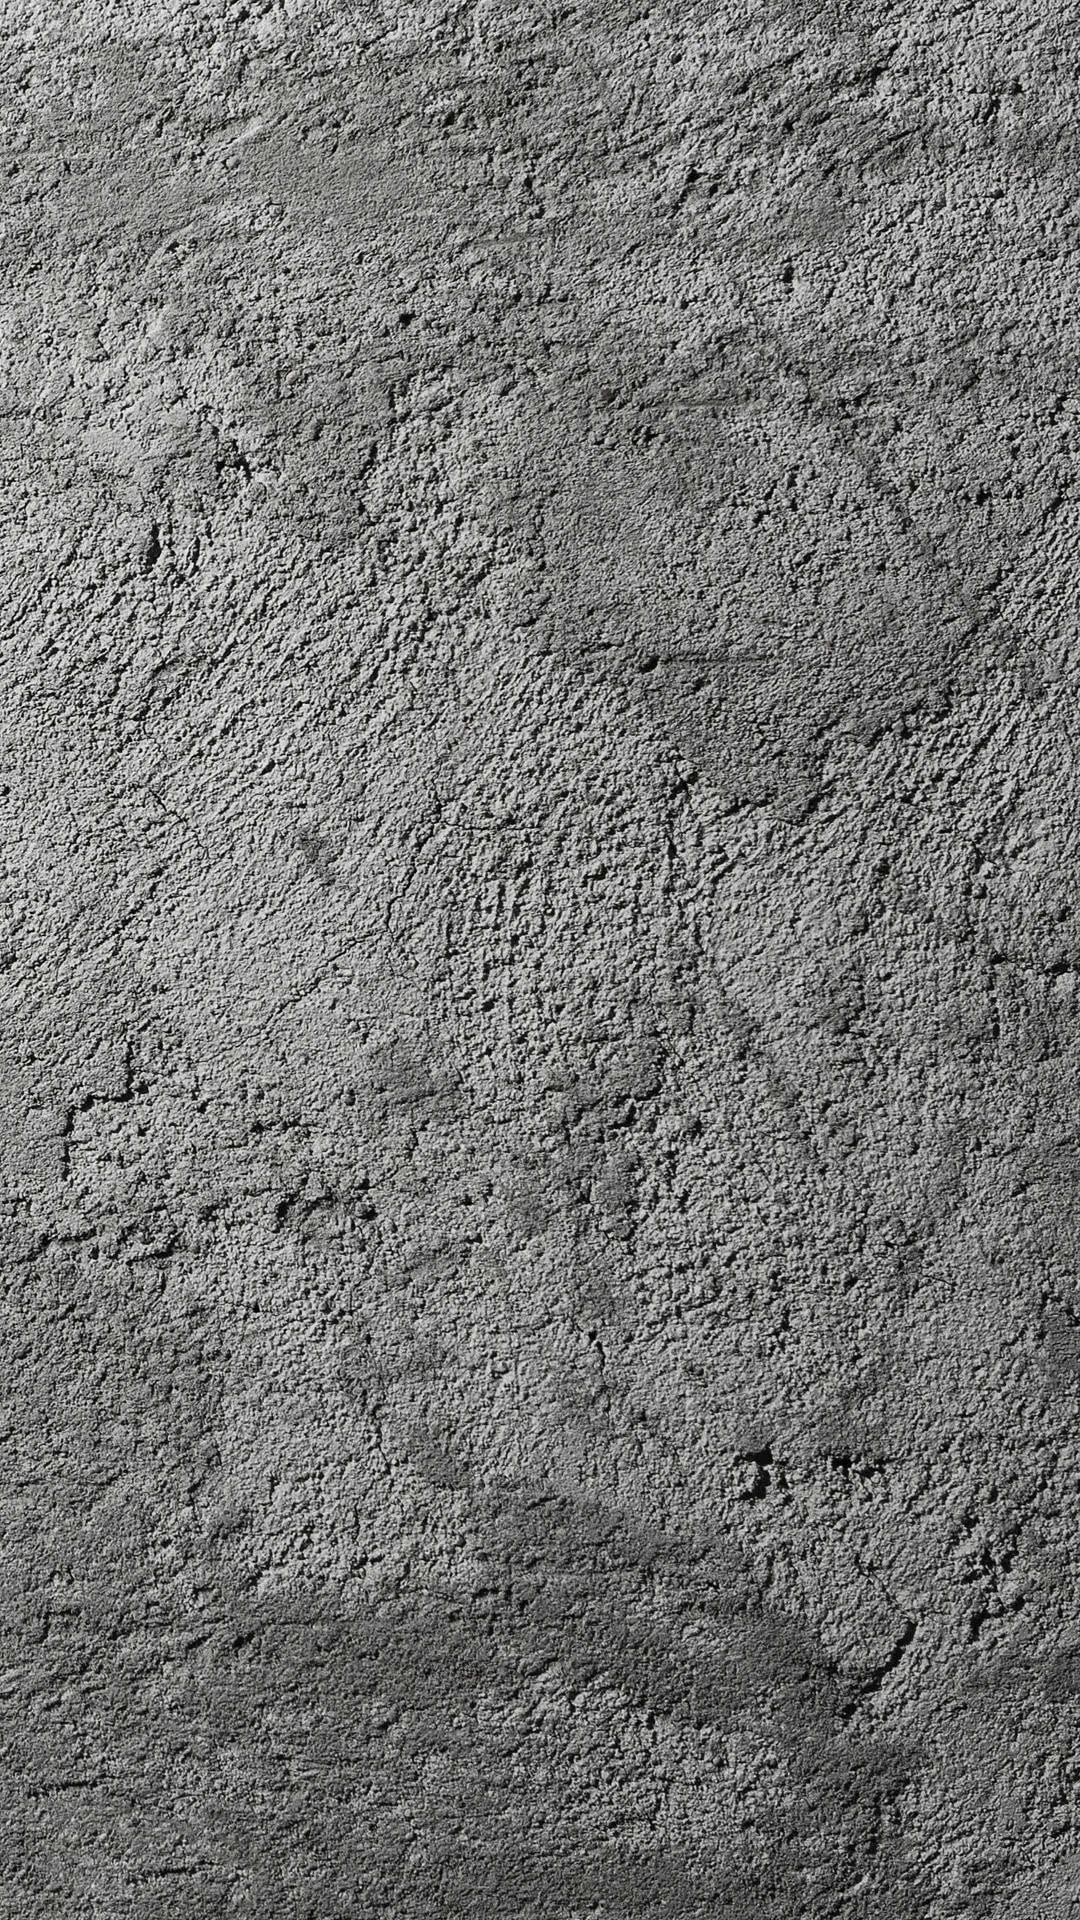 Concrete Dark Grey Cool Iphone X Wallpaper Iphone Wallpapers